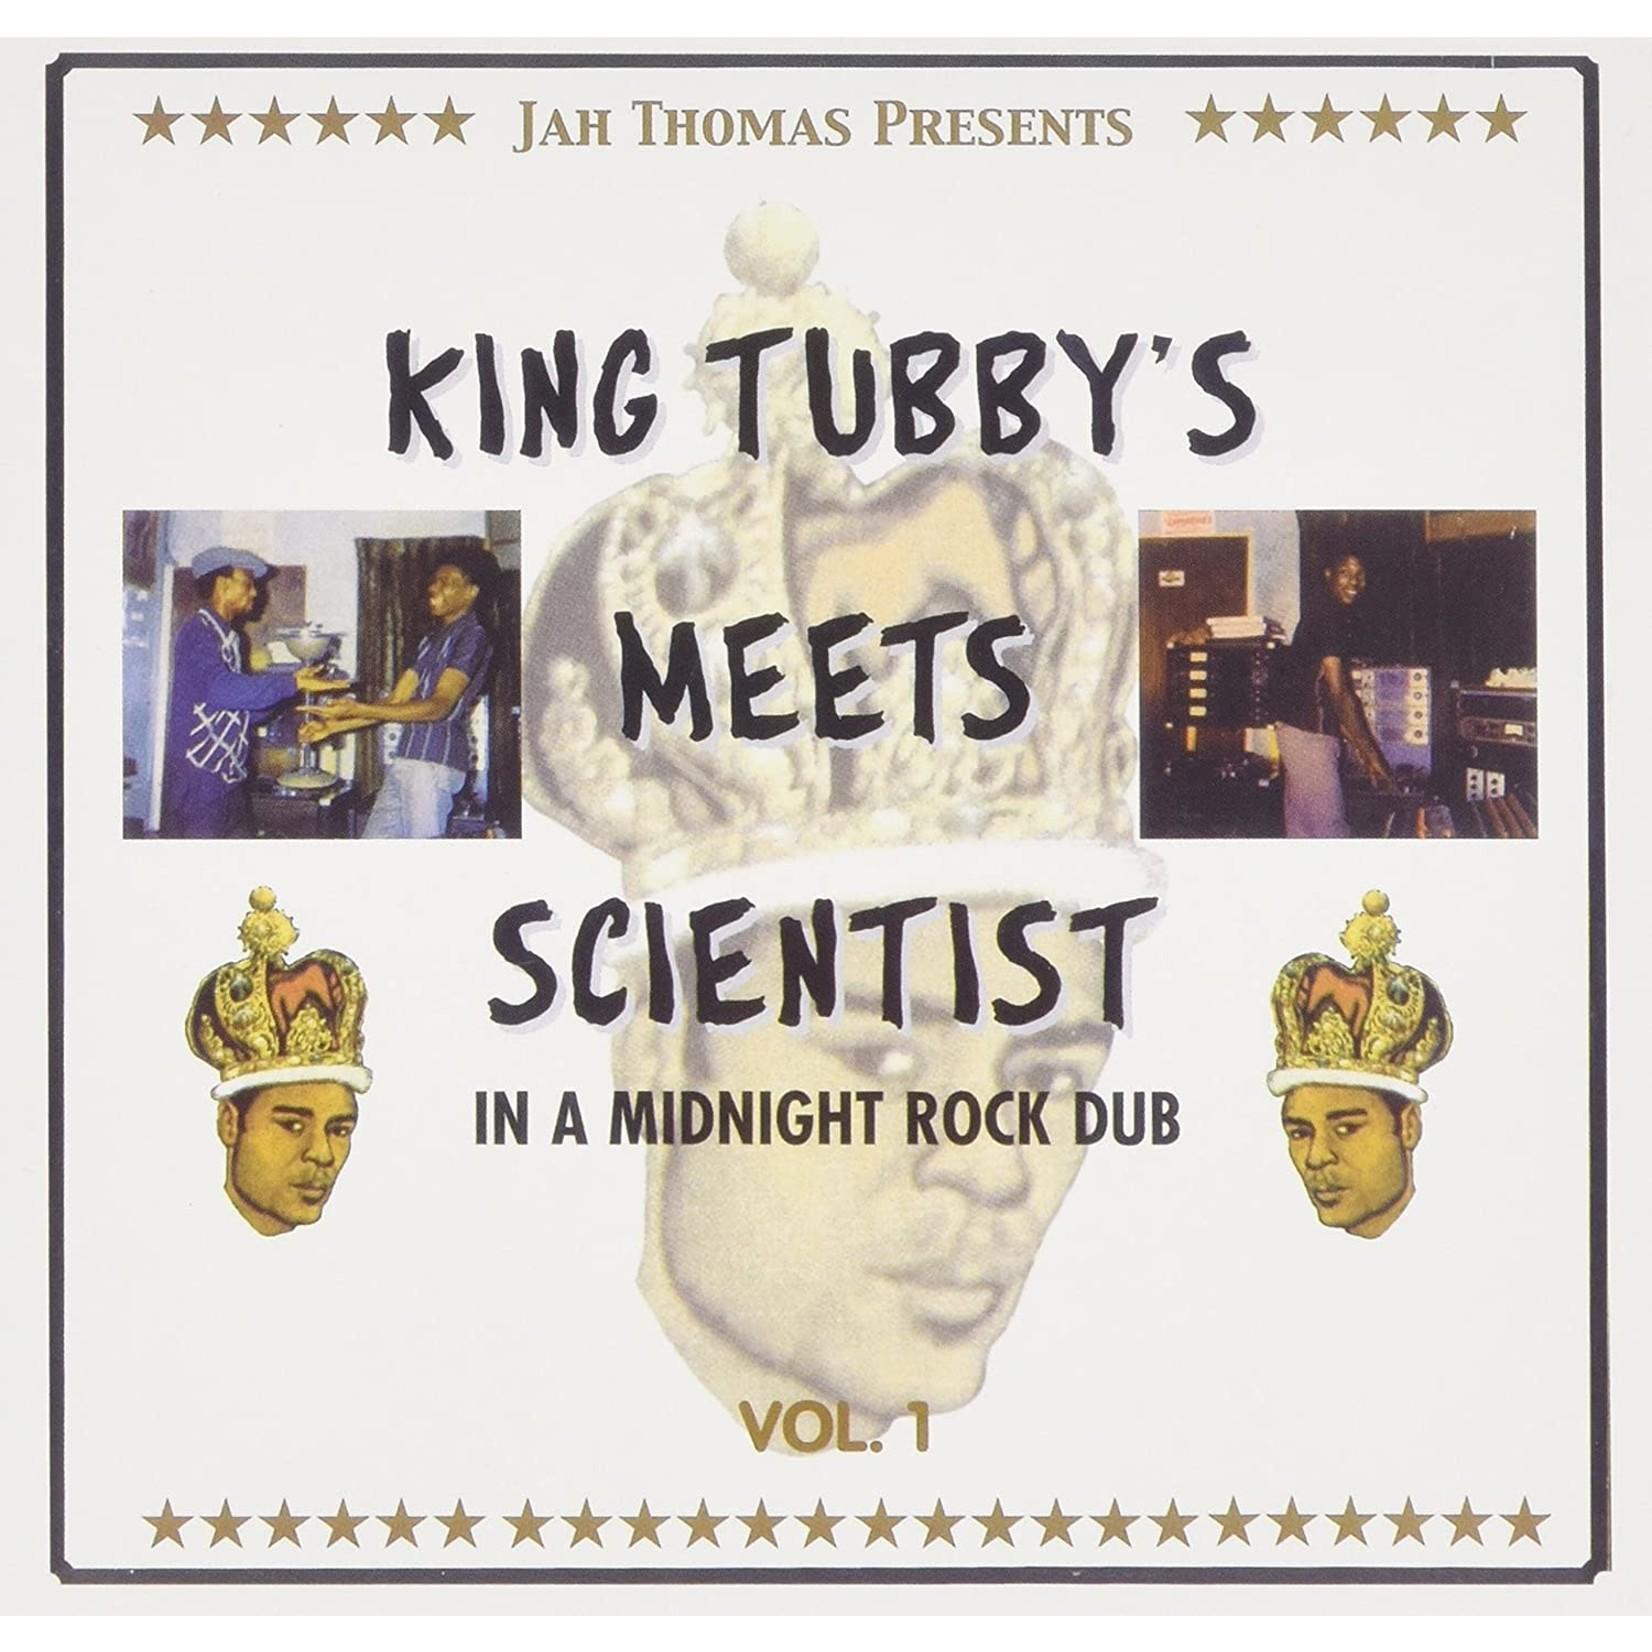 King Tubby: Meets Scientist in a Midnight Rock Dub (Vol. 1)